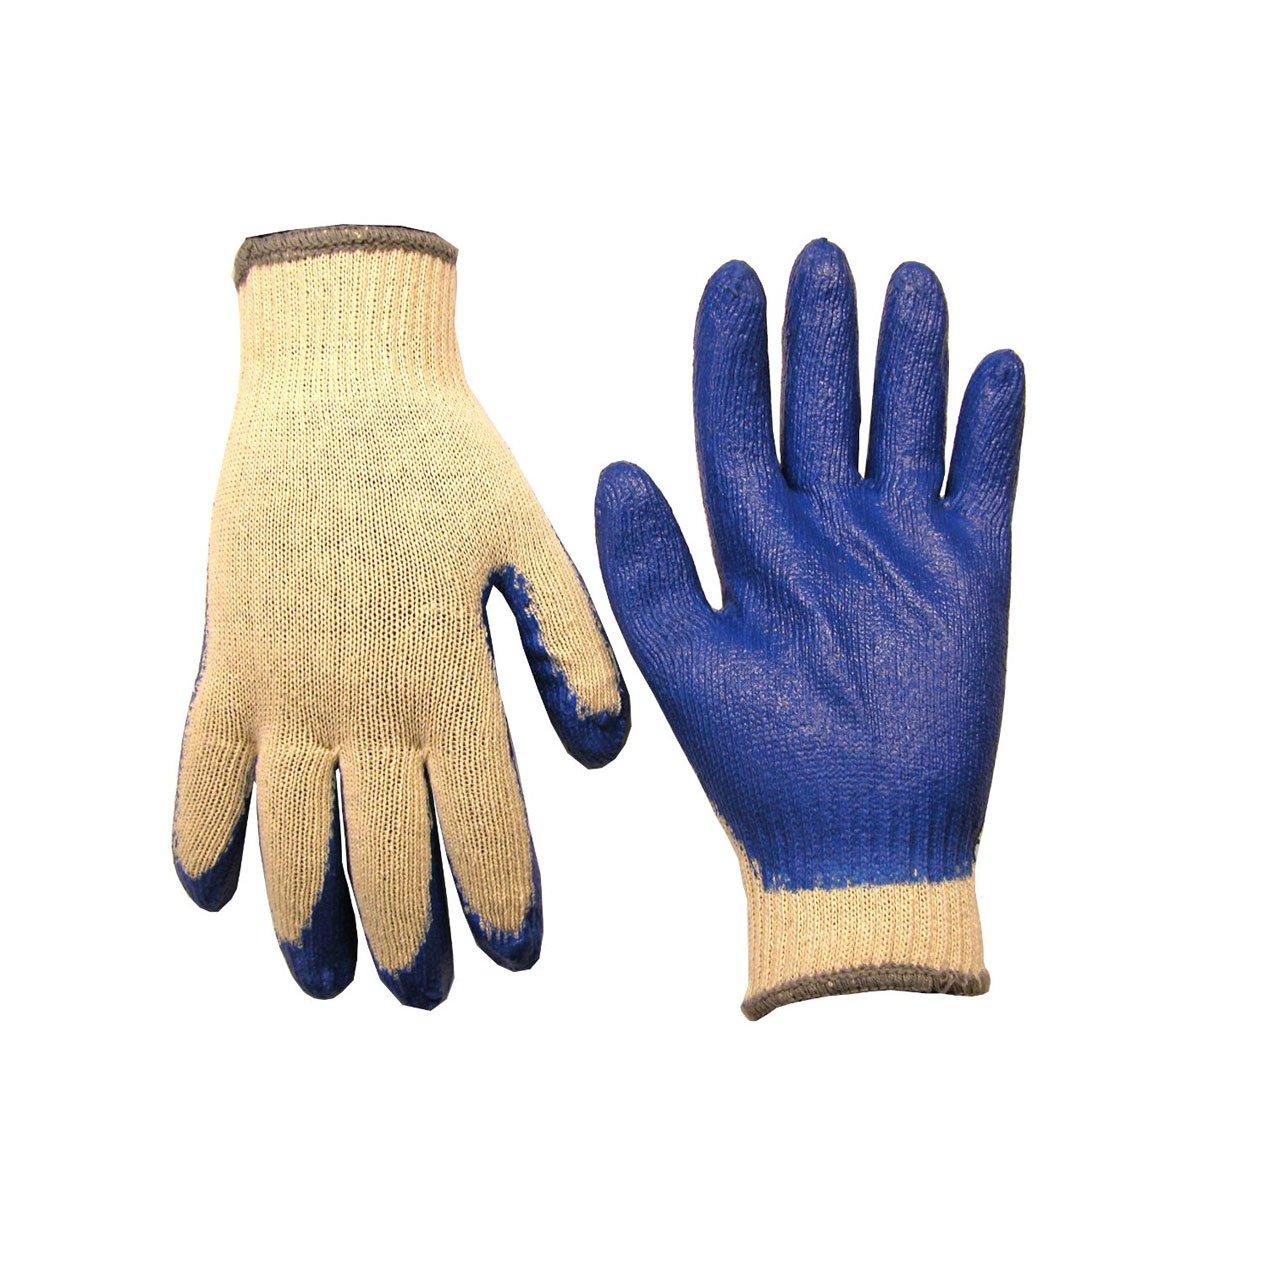 Dottie 2029L String Knit Gloves with Blue Dip Large